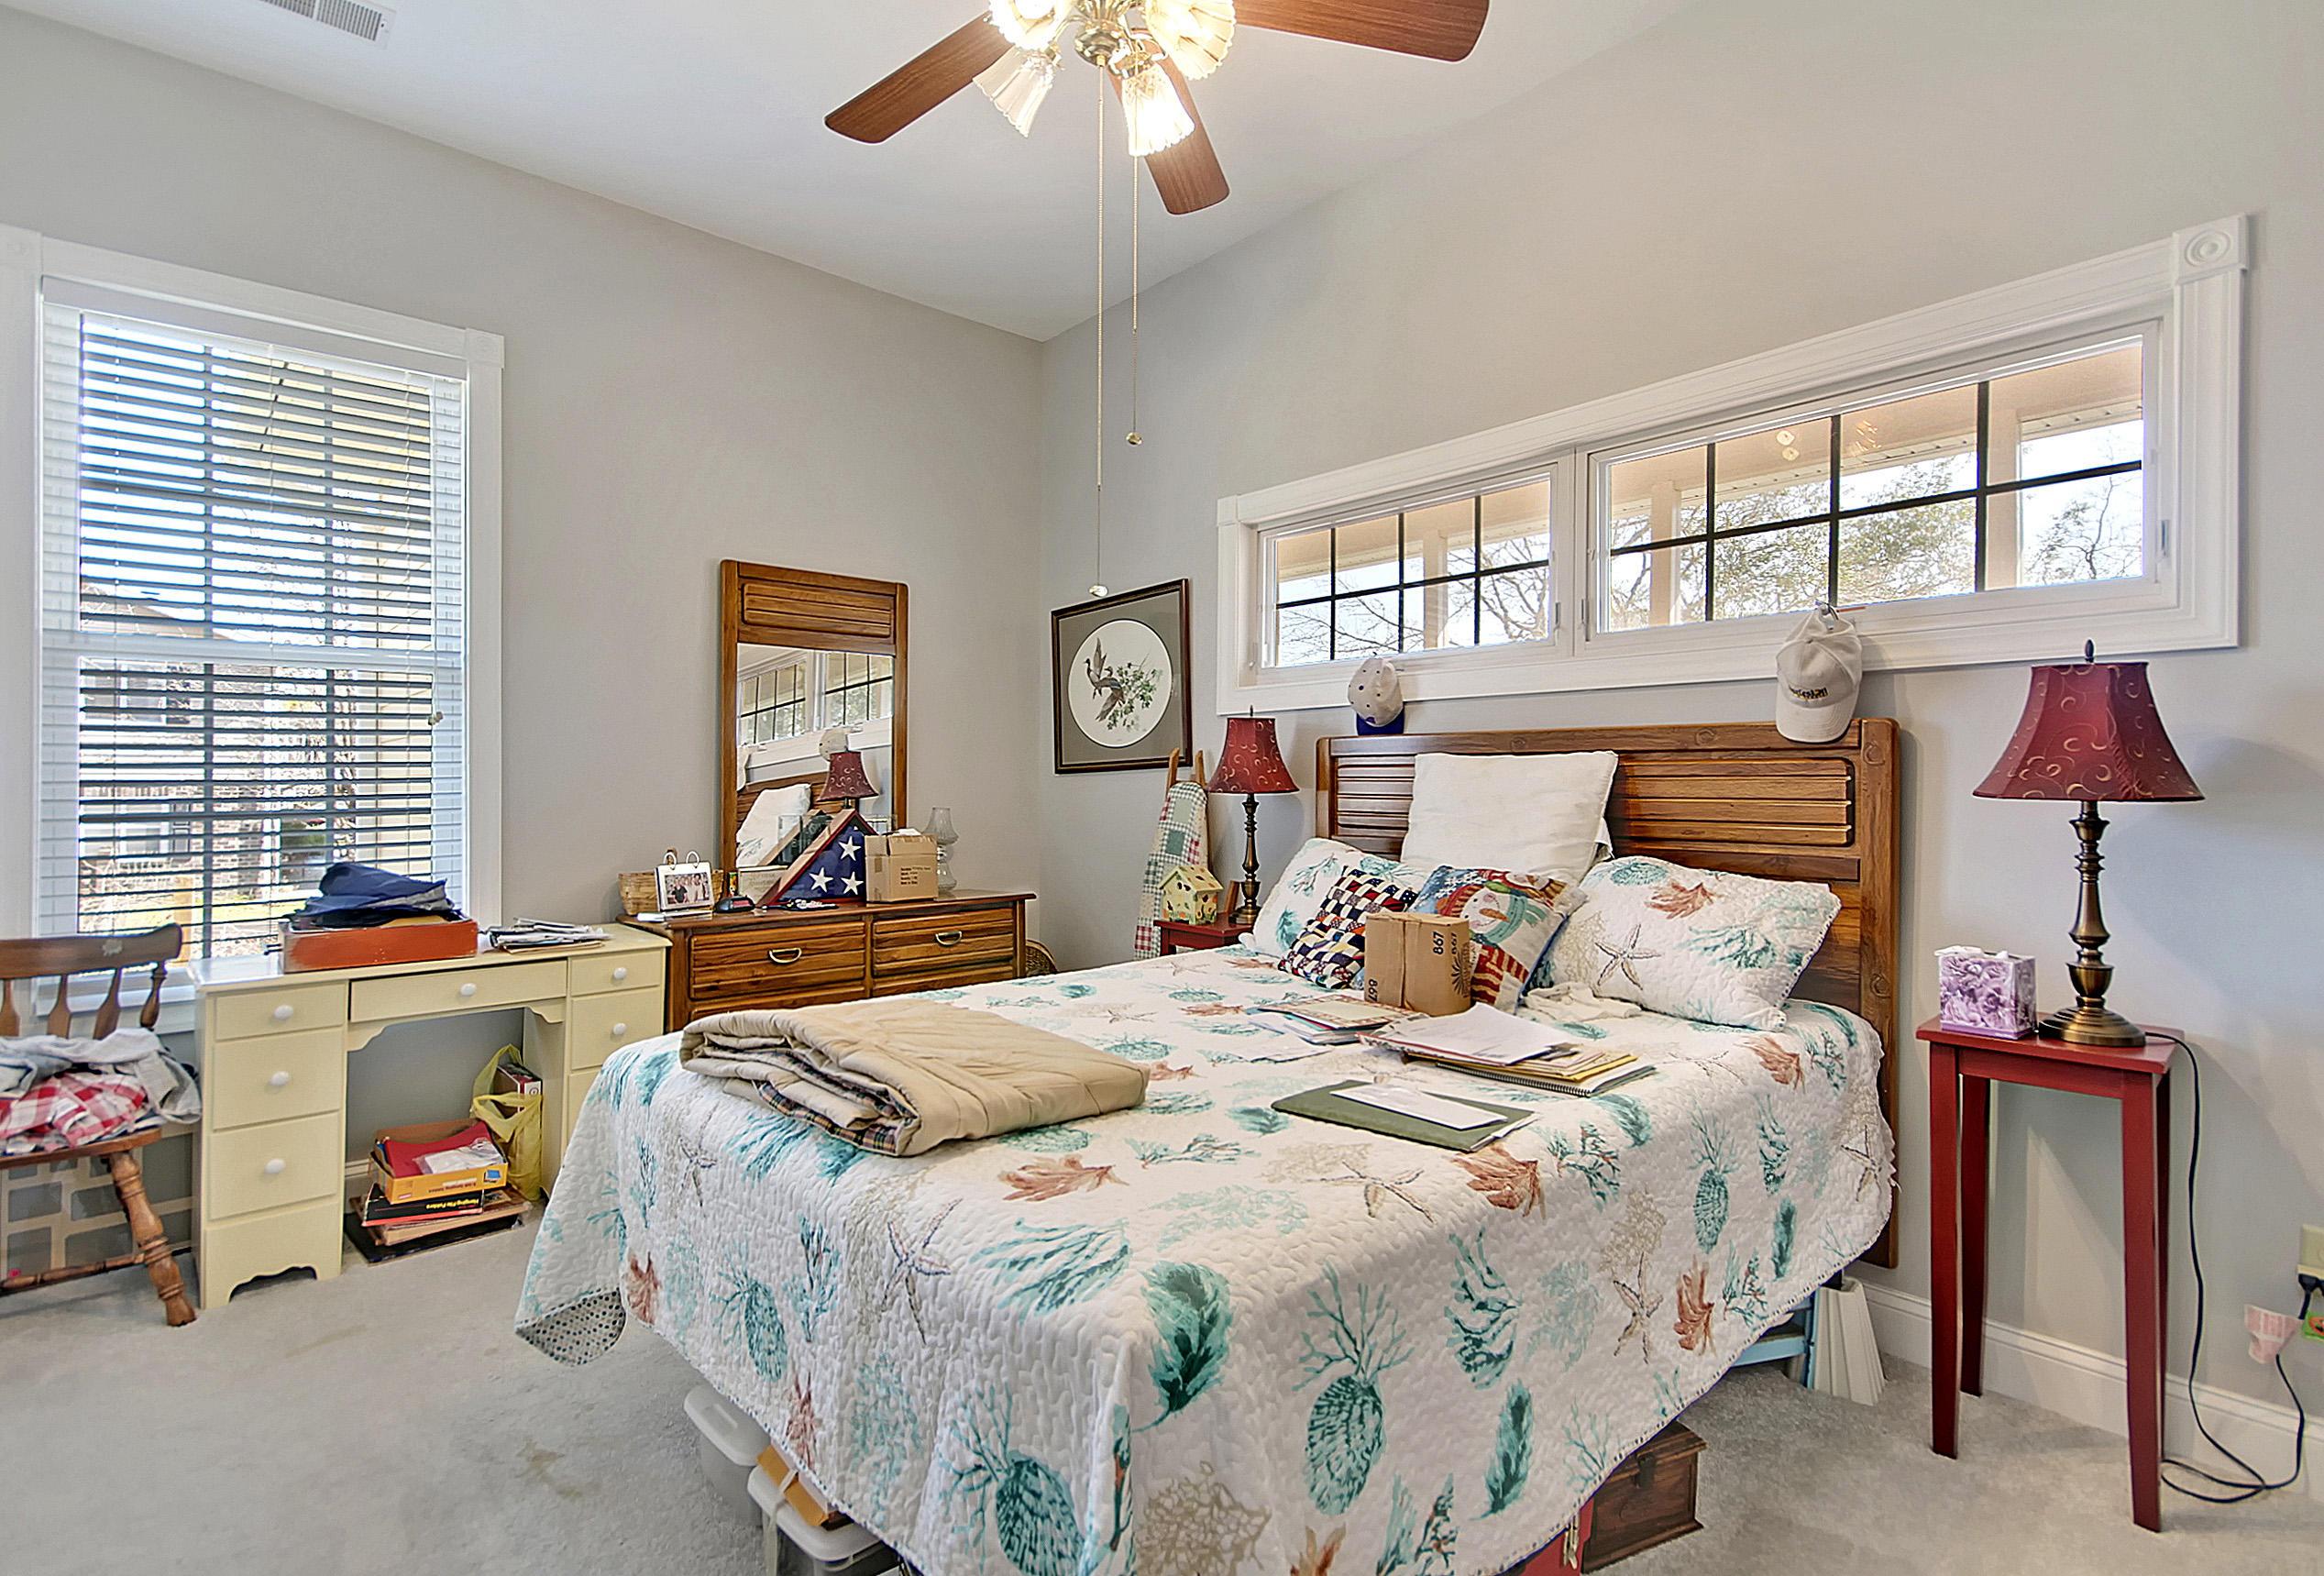 Cross Subd (Longpoint) Homes For Sale - 1191 Longpoint, Cross, SC - 47